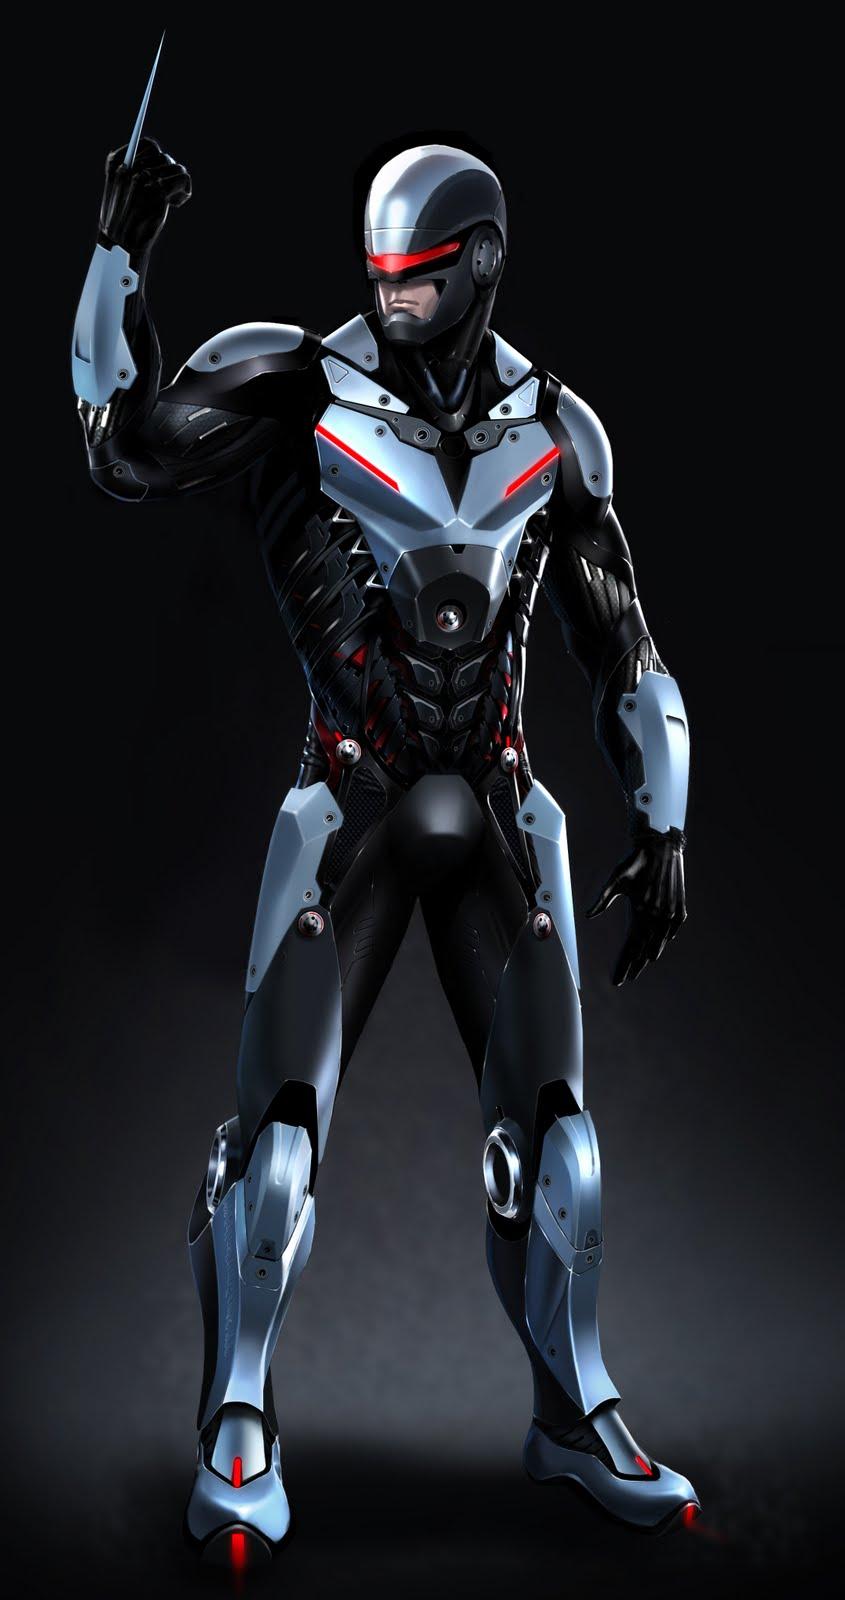 http://2.bp.blogspot.com/-sLJxts_CG68/TxXZJb7pLtI/AAAAAAAACgo/ZCe-59K2mmA/s1600/RoboCop+redesign+2.jpg